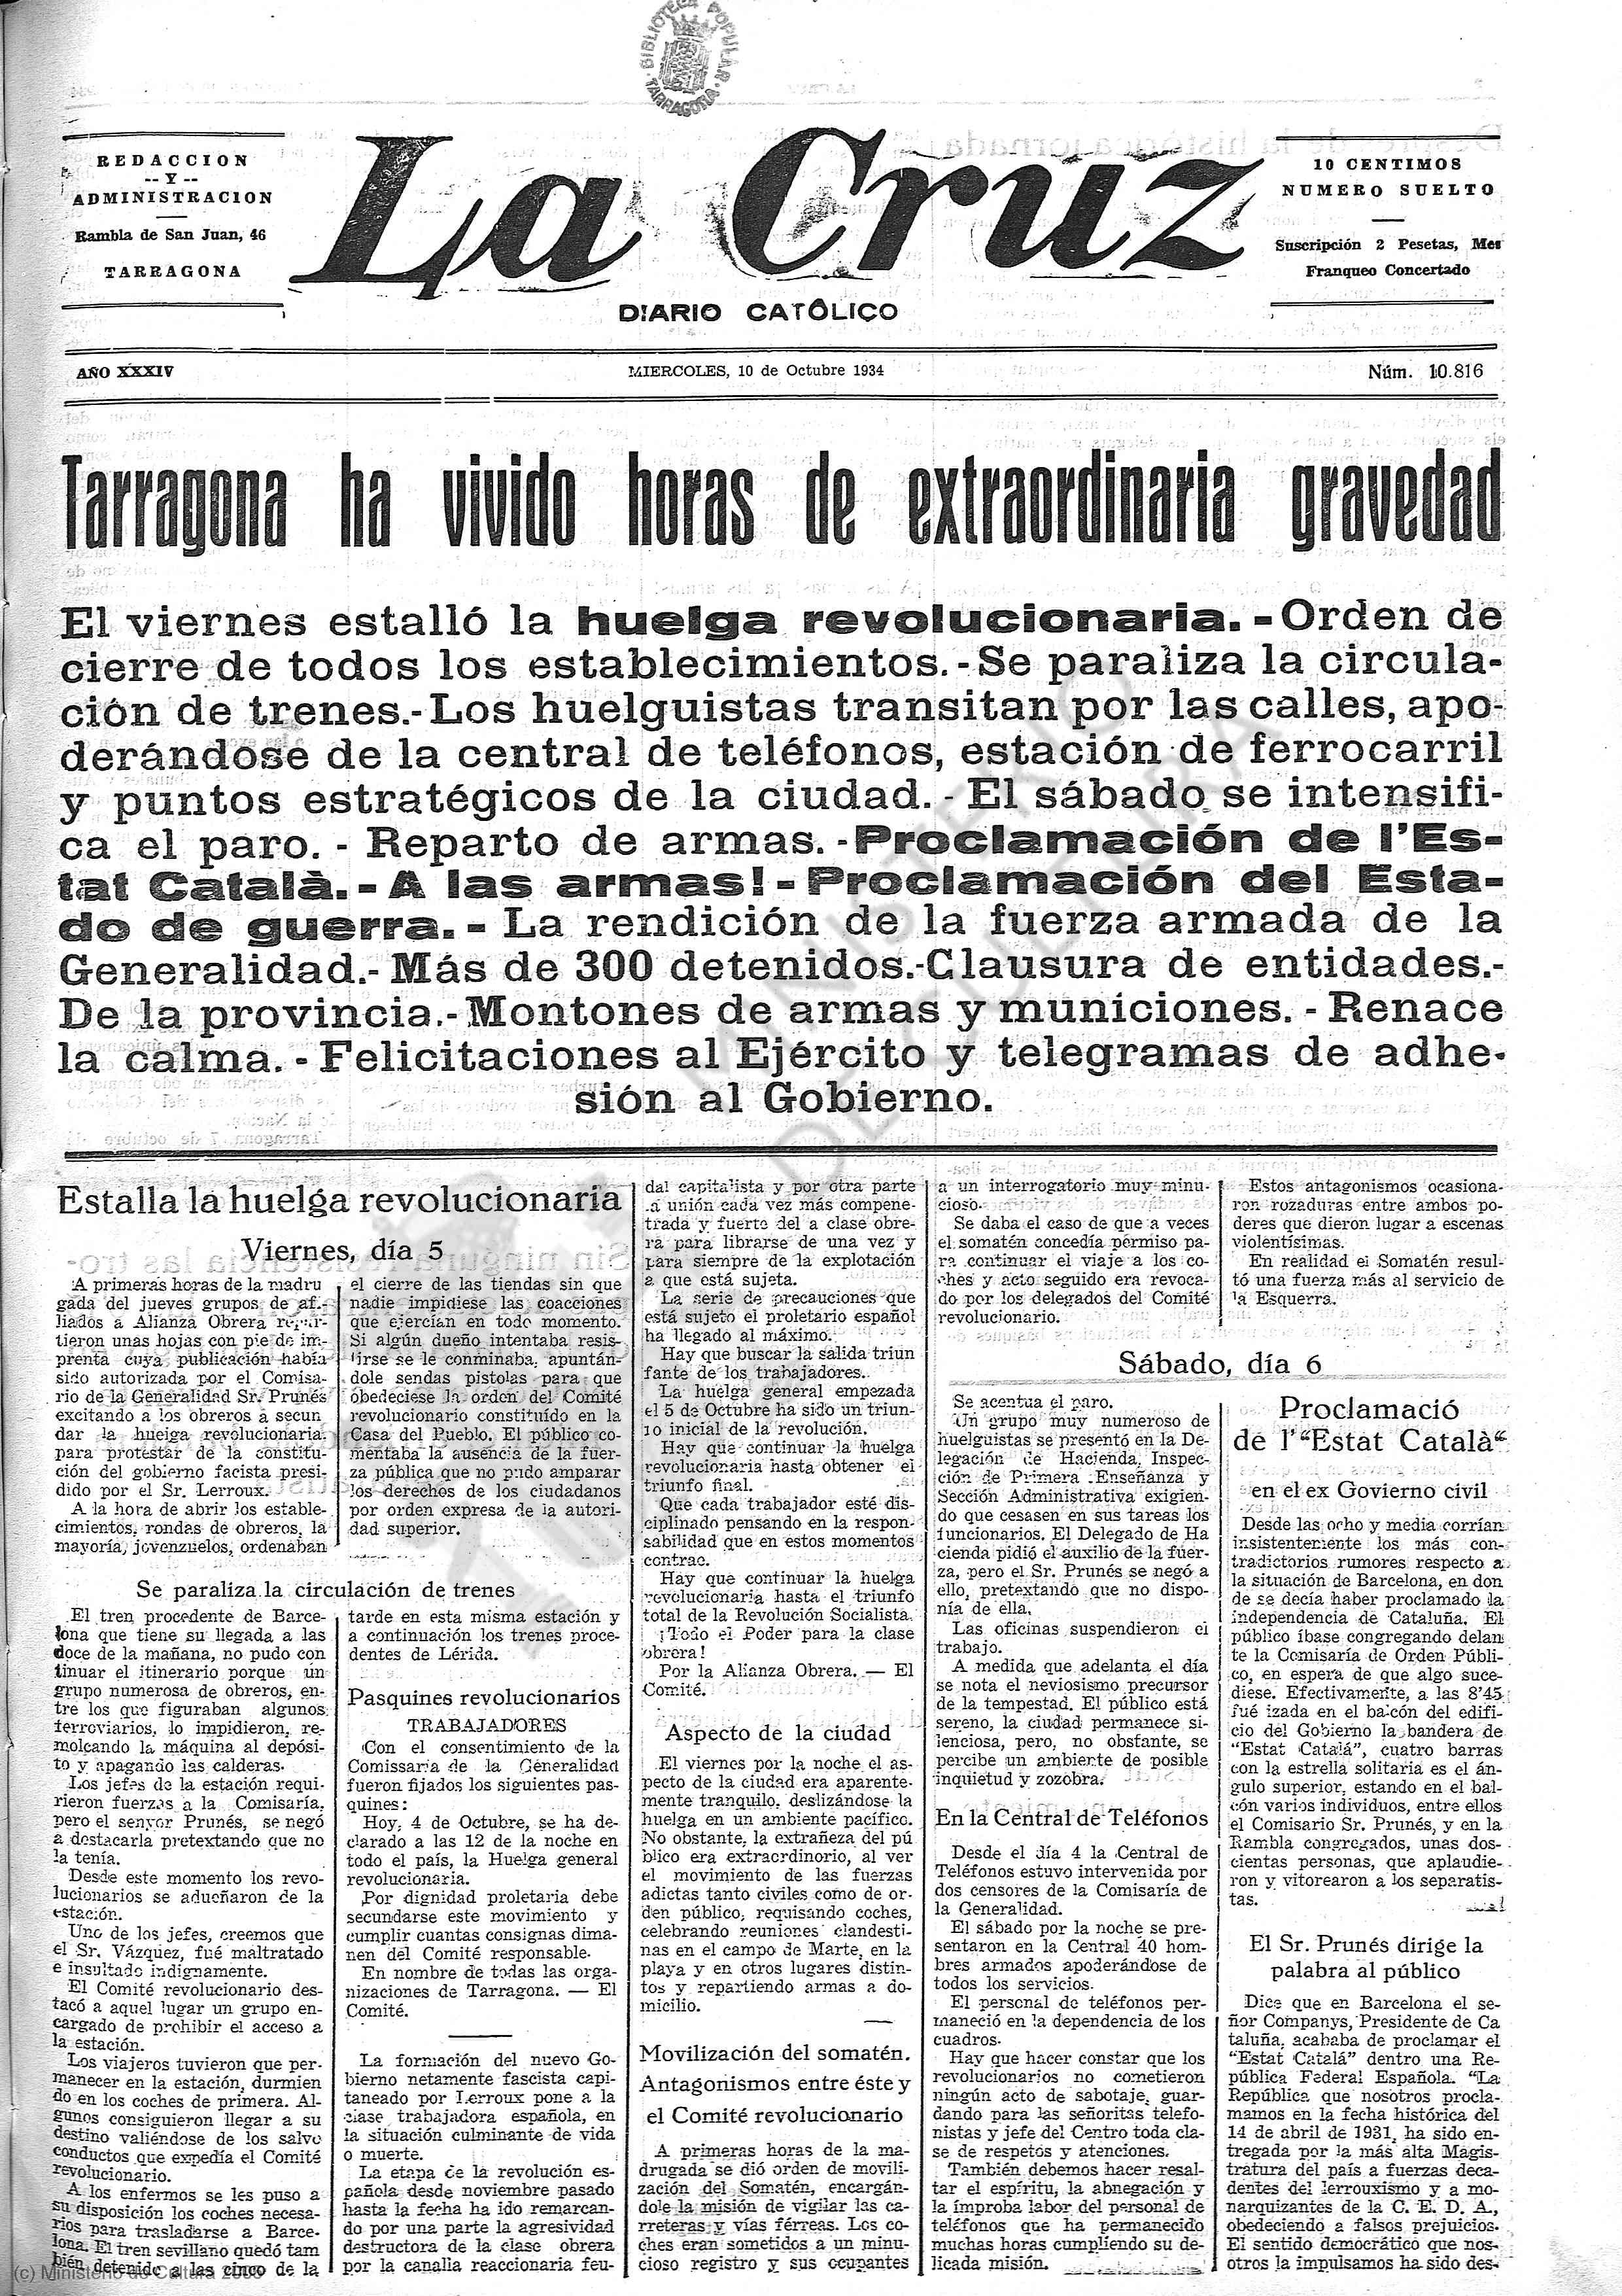 La Cruz, 10 de octubre de 1934.